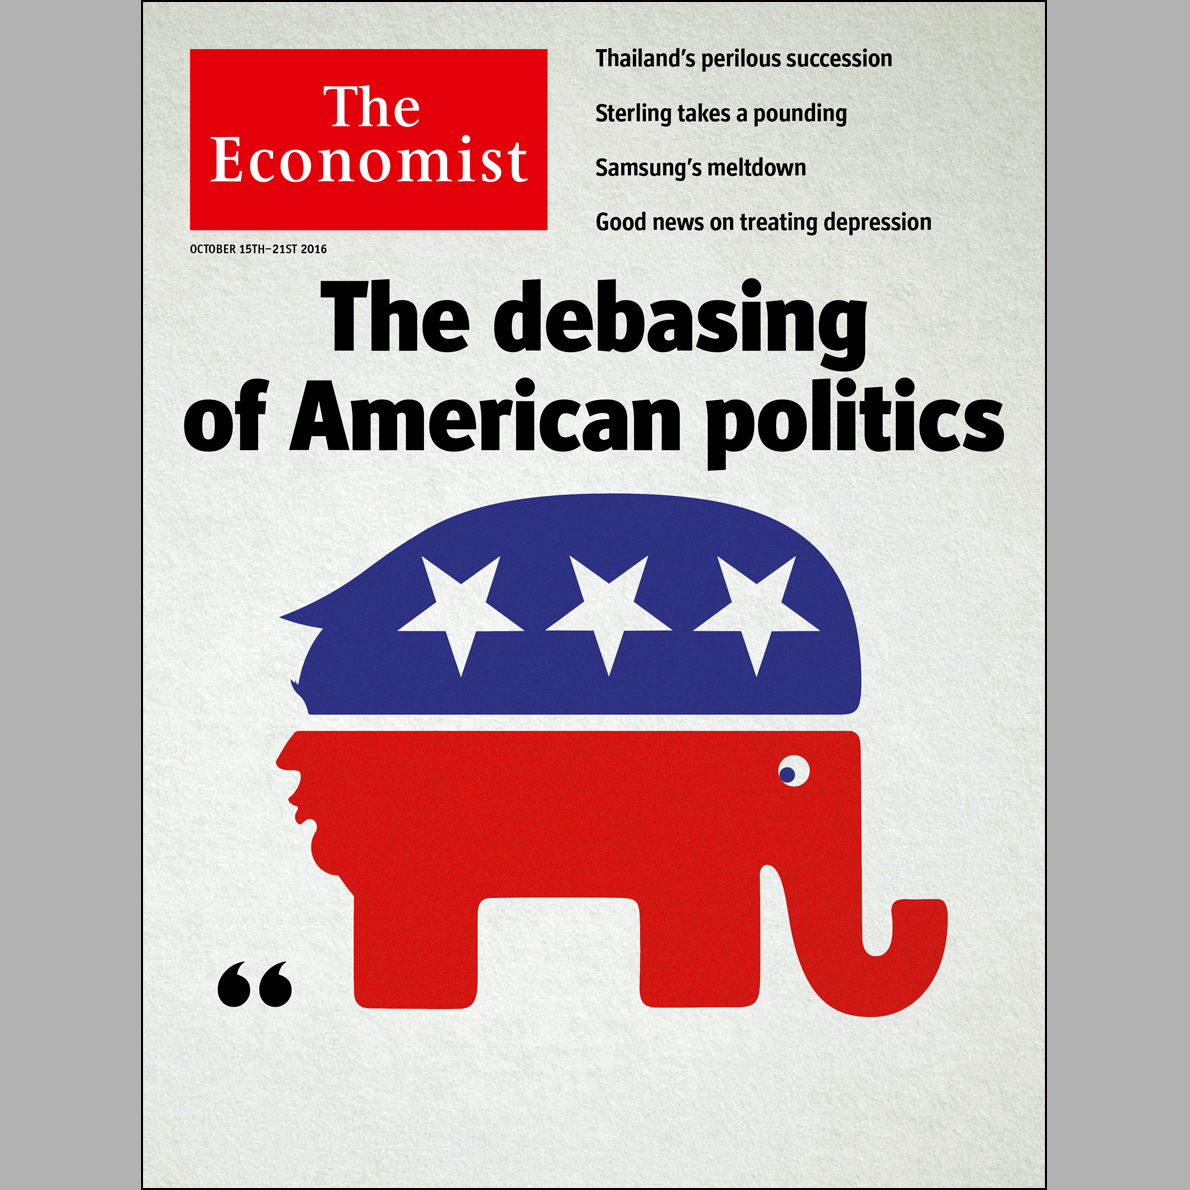 Donald Trump's rise seen through The Economist's covers